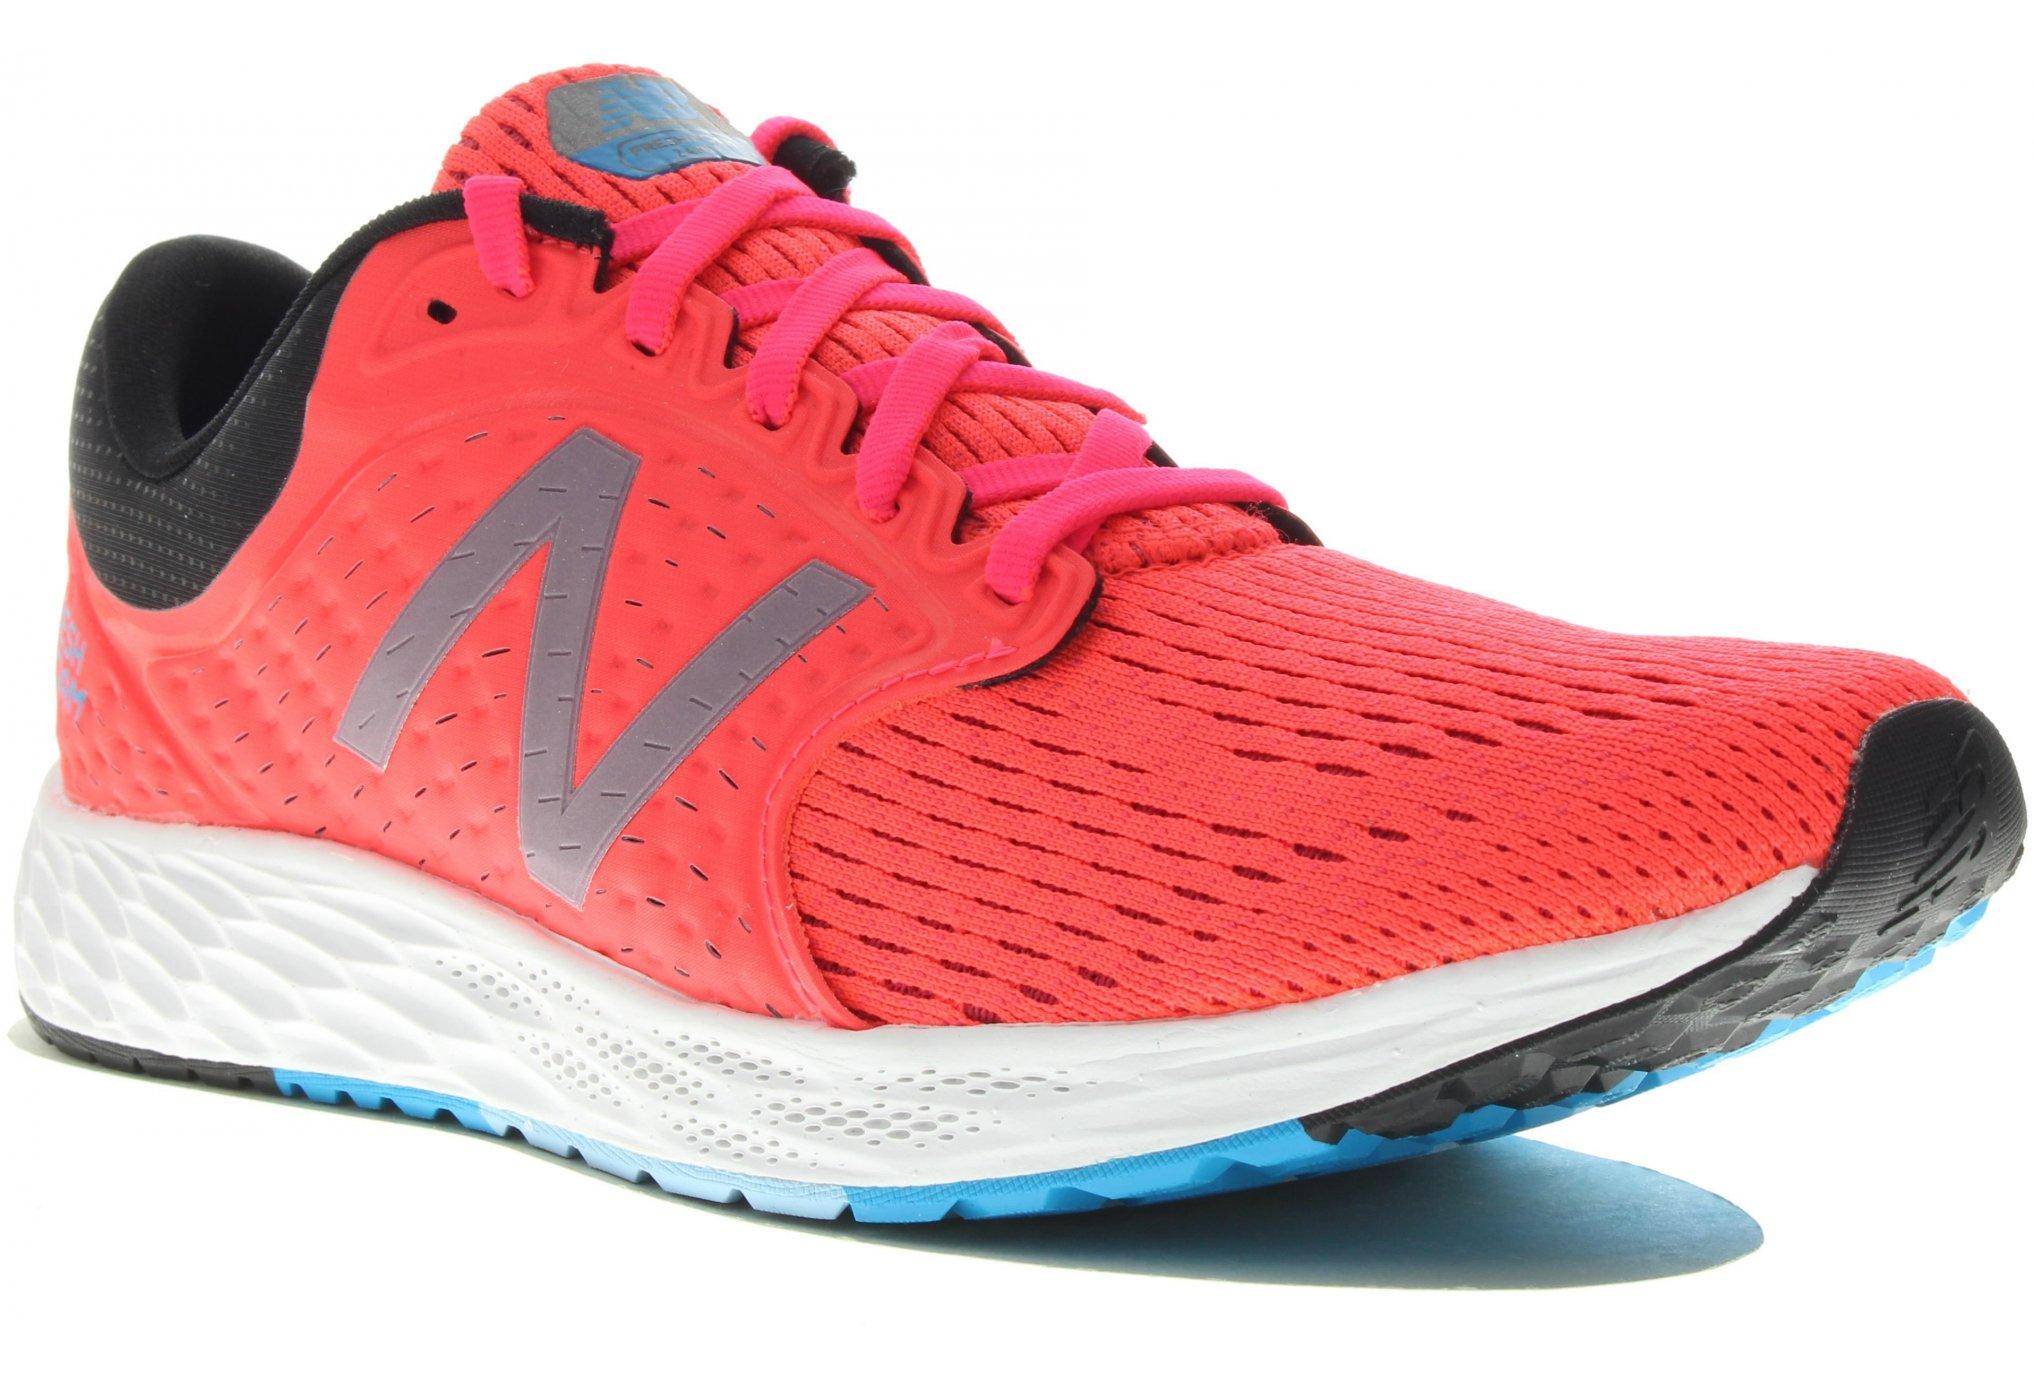 New Balance Fresh Foam Zante V4 W Diététique Chaussures femme